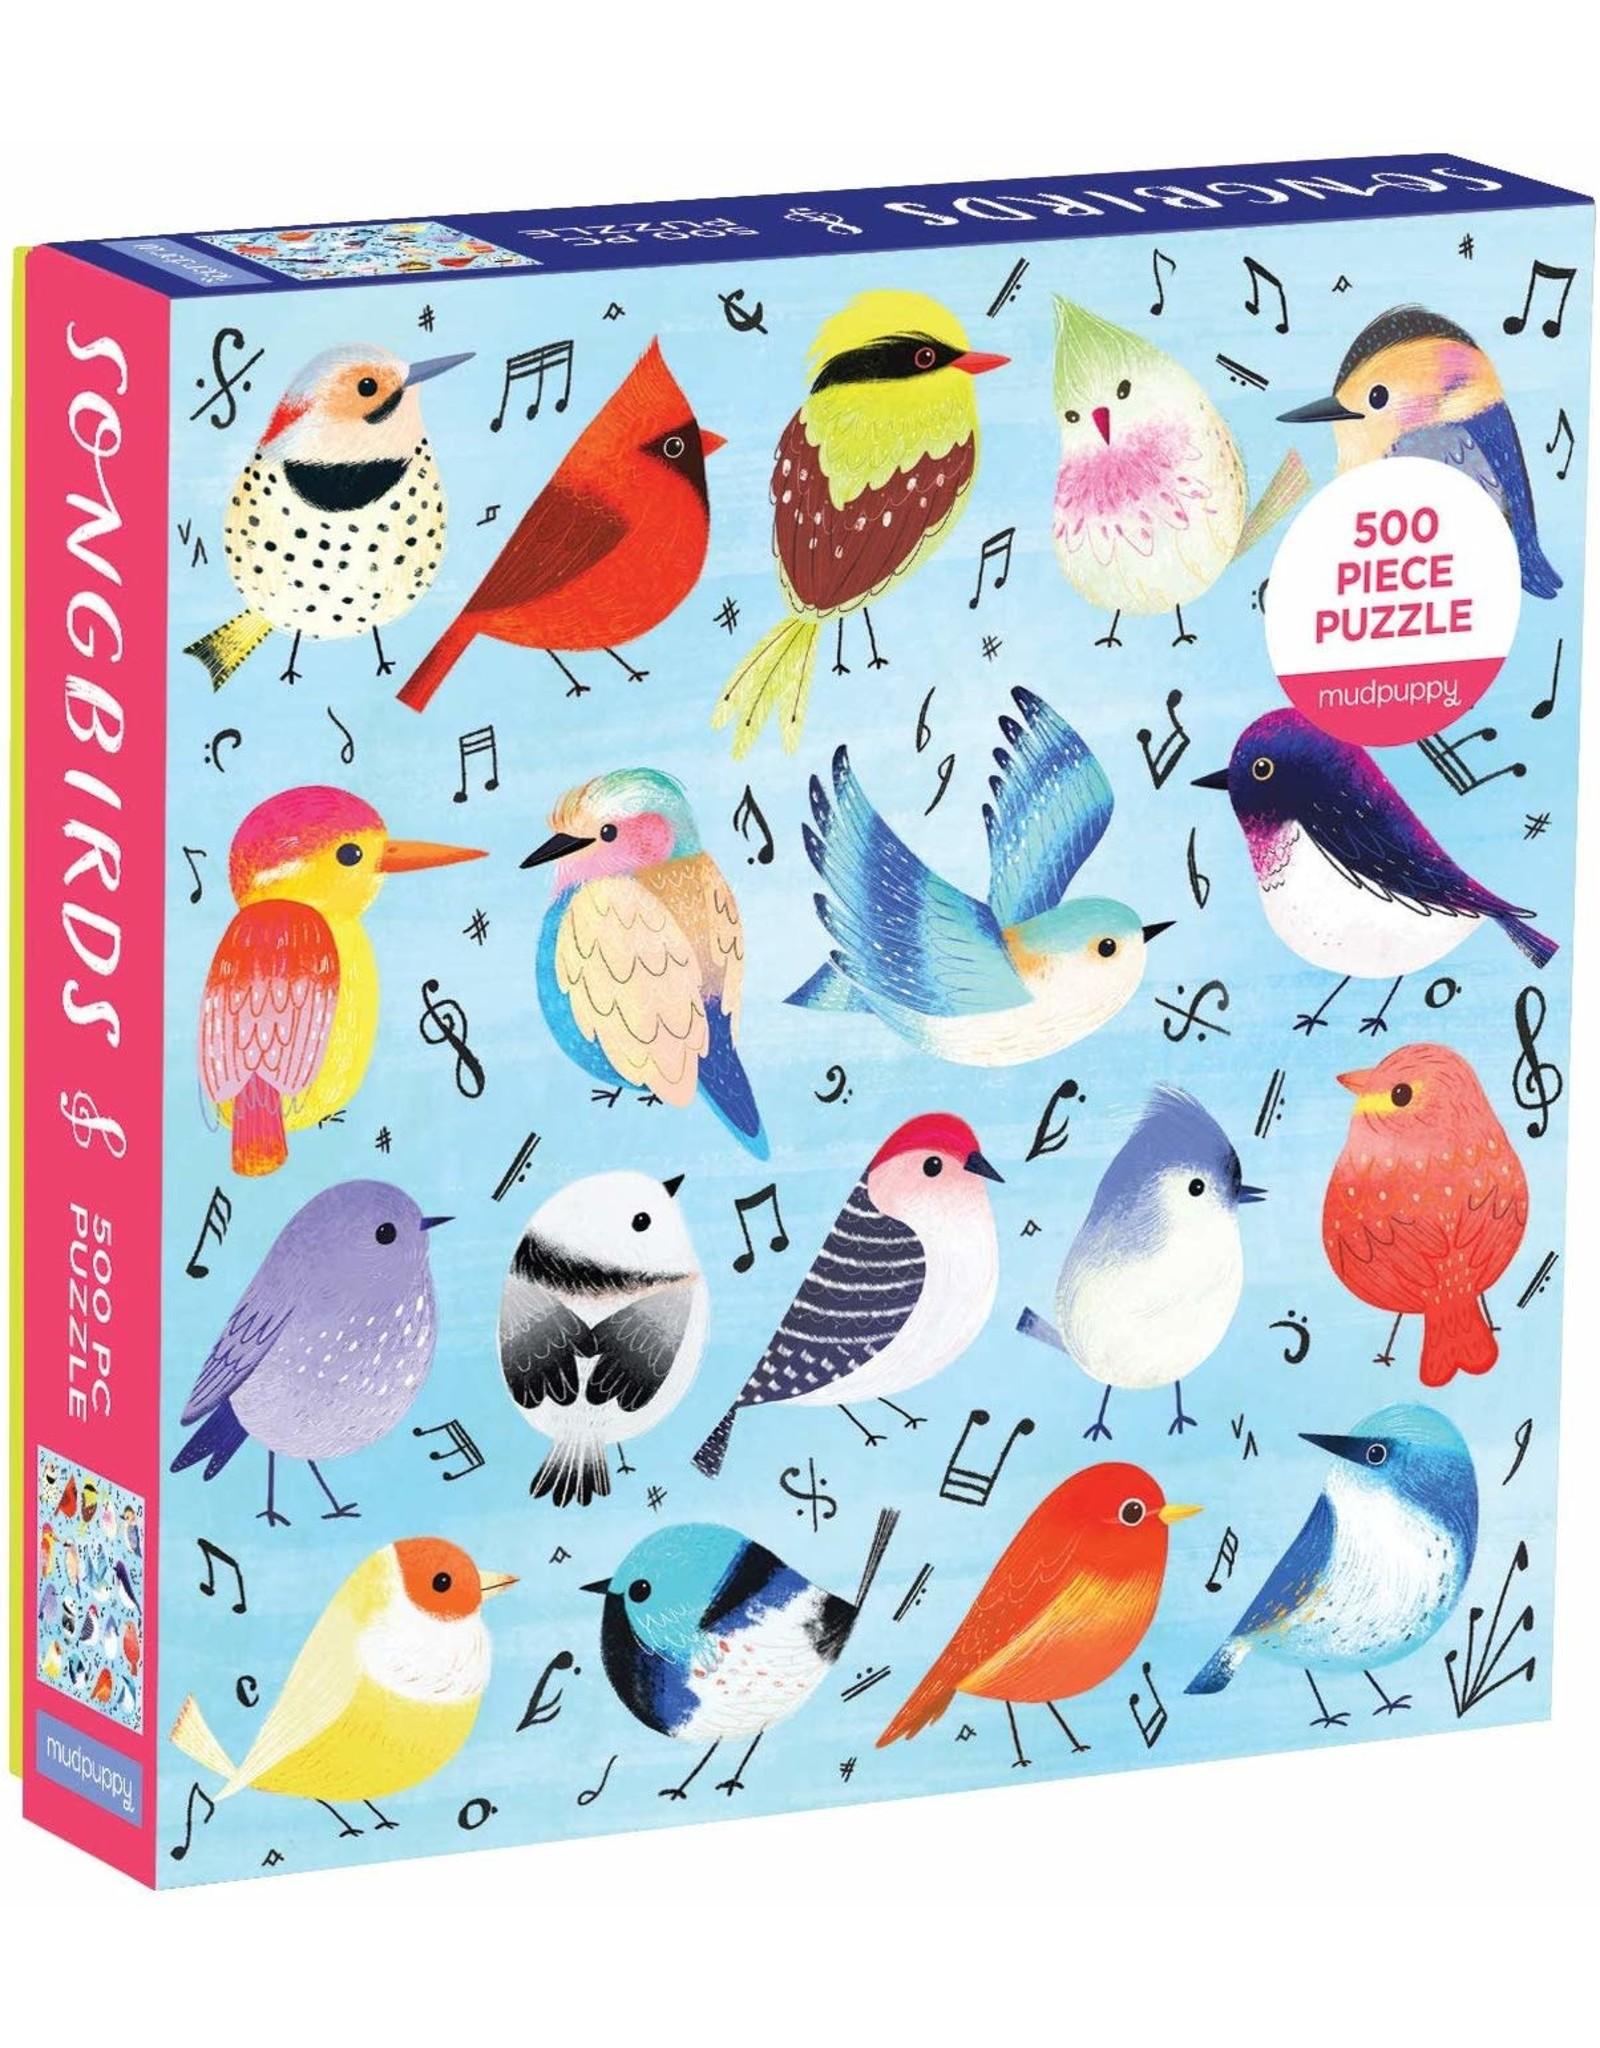 Mudpuppy Songbirds 500pc